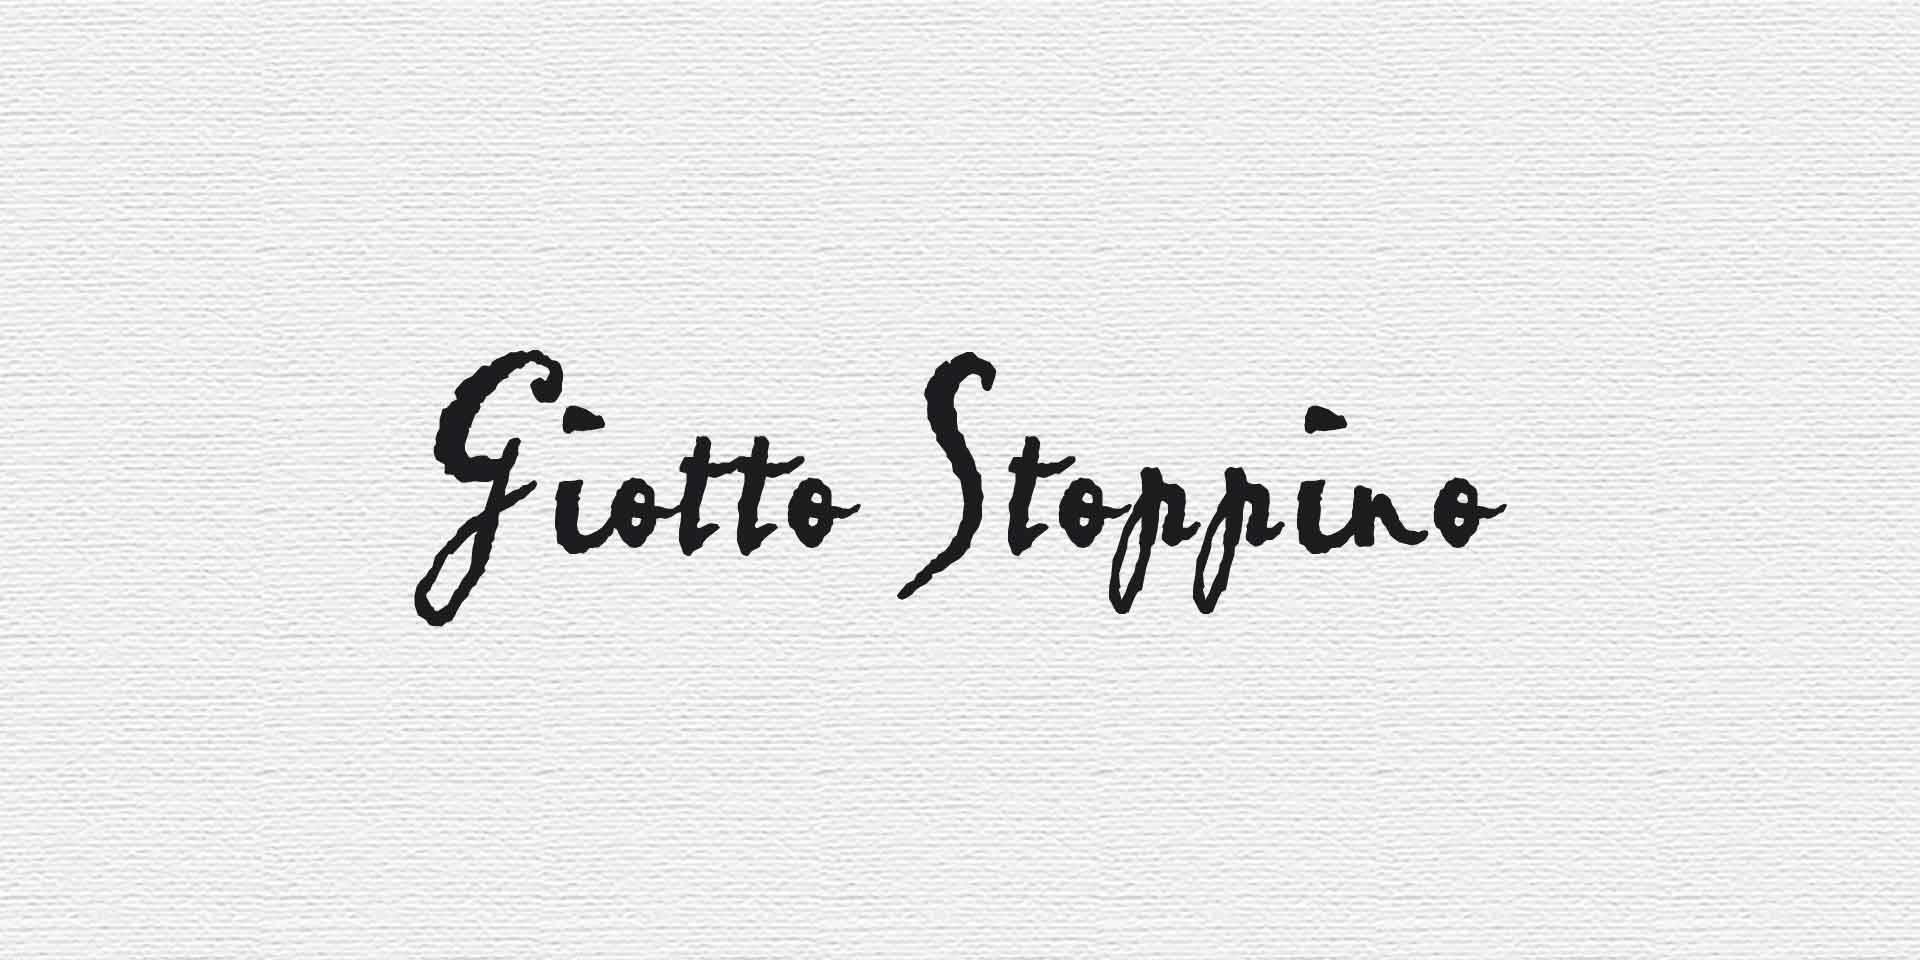 Giotto Stoppino